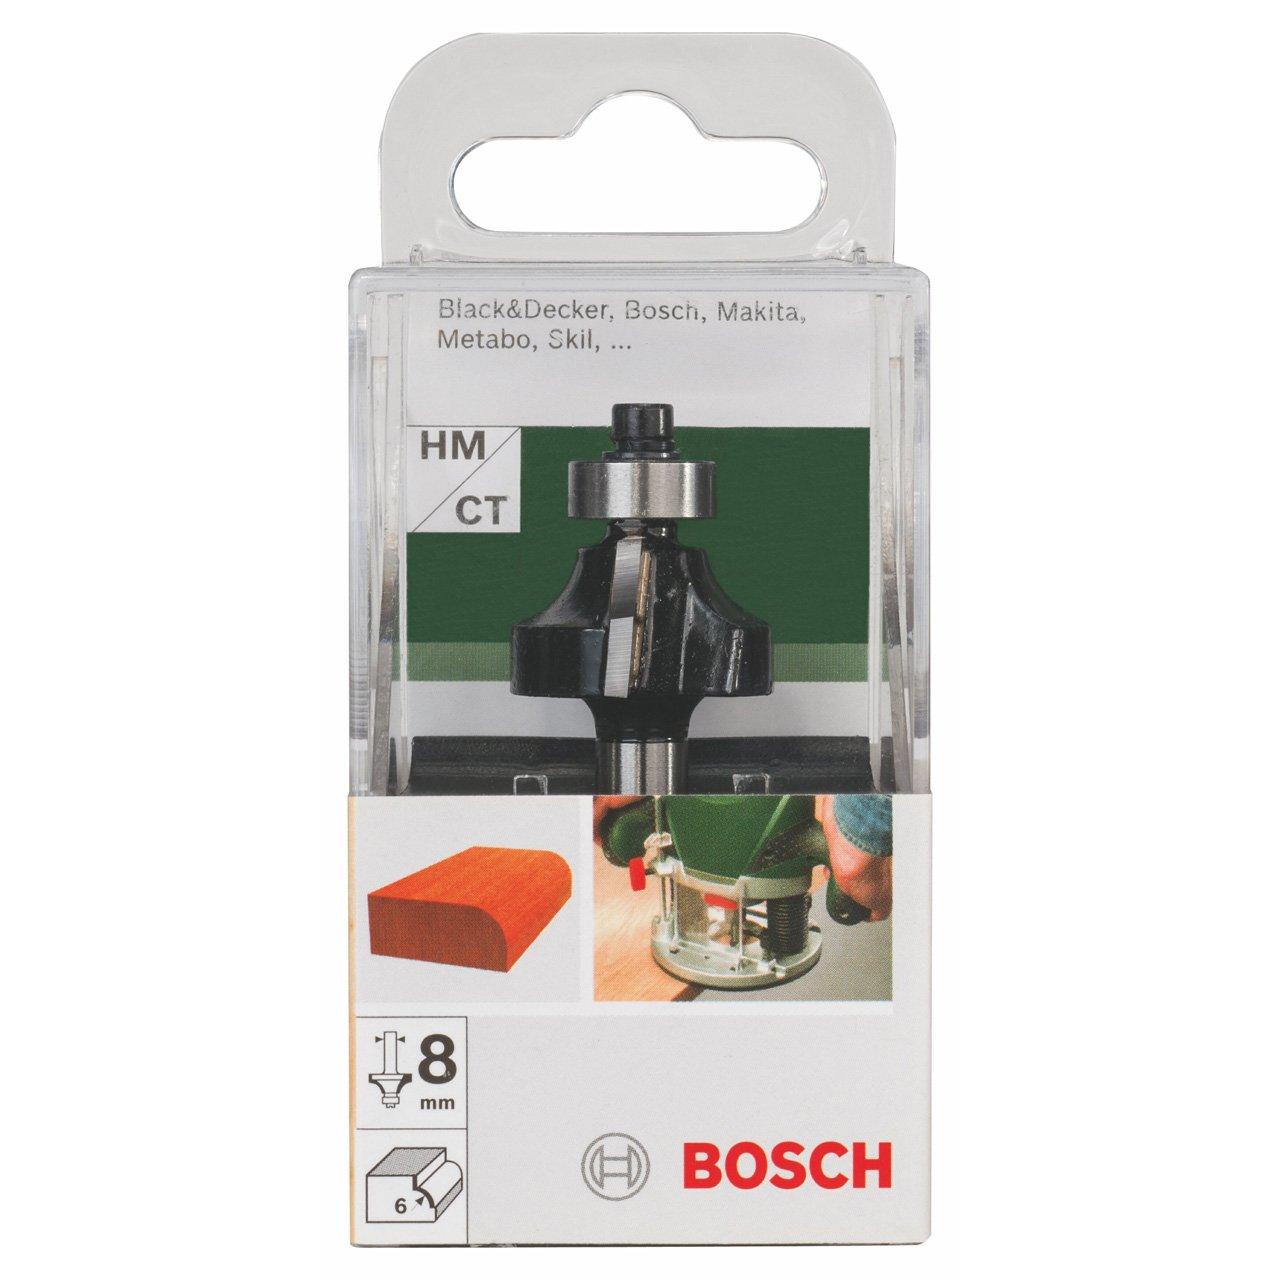 /Ø 8 mm Bosch DIY Abrundfr/äser HM f/ür Holz